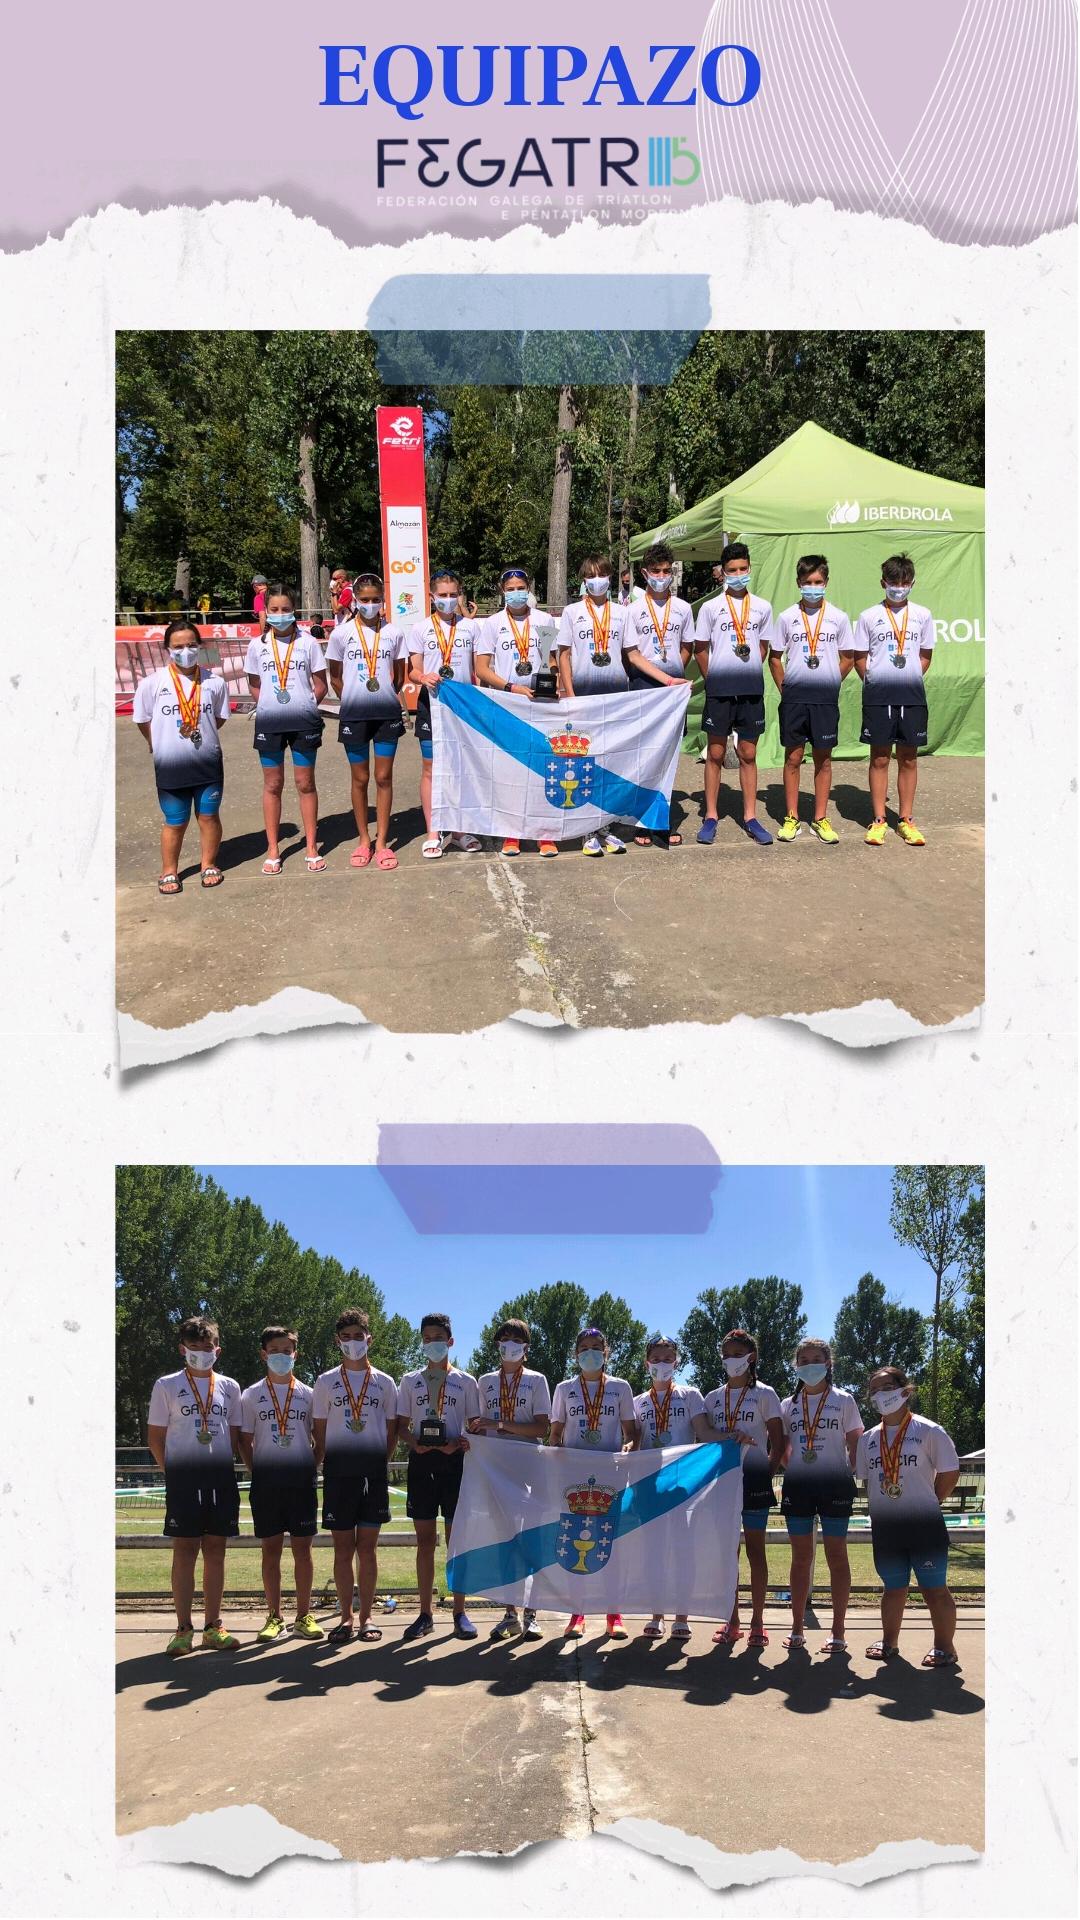 equipazo selección galega de triatlon